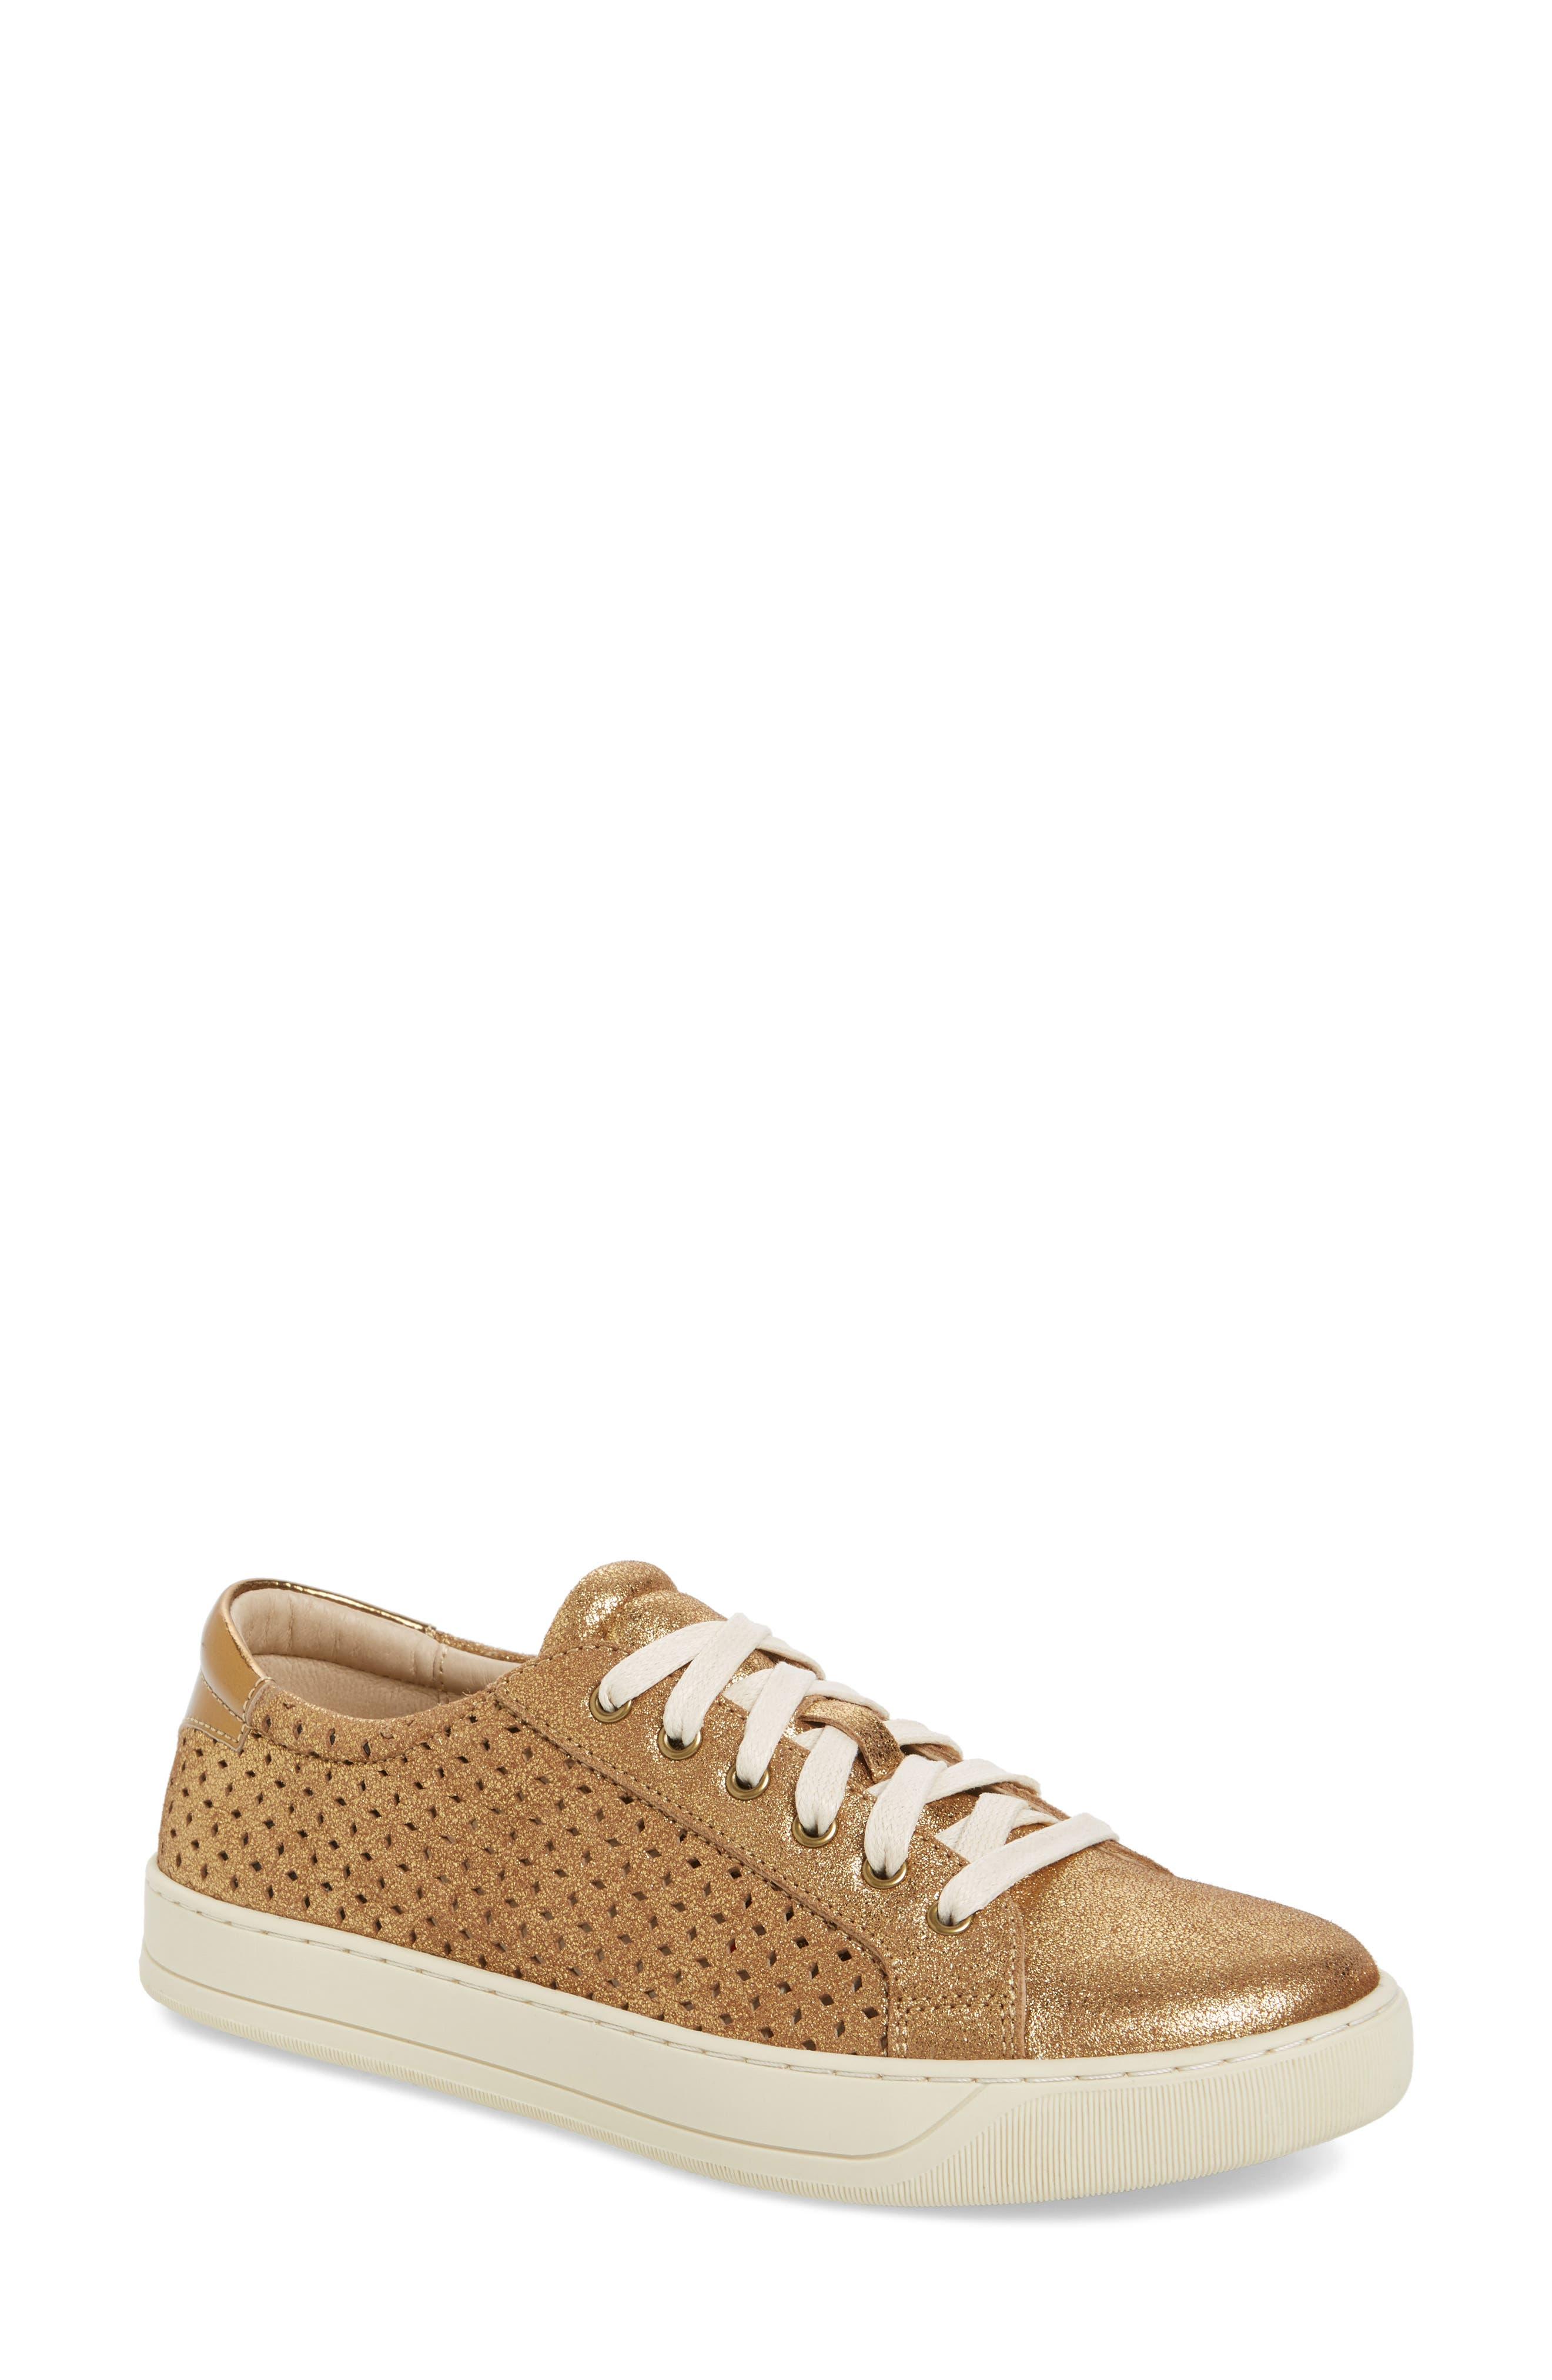 Alternate Image 1 Selected - Johnston & Murphy Emerson Perforated Sneaker (Women)